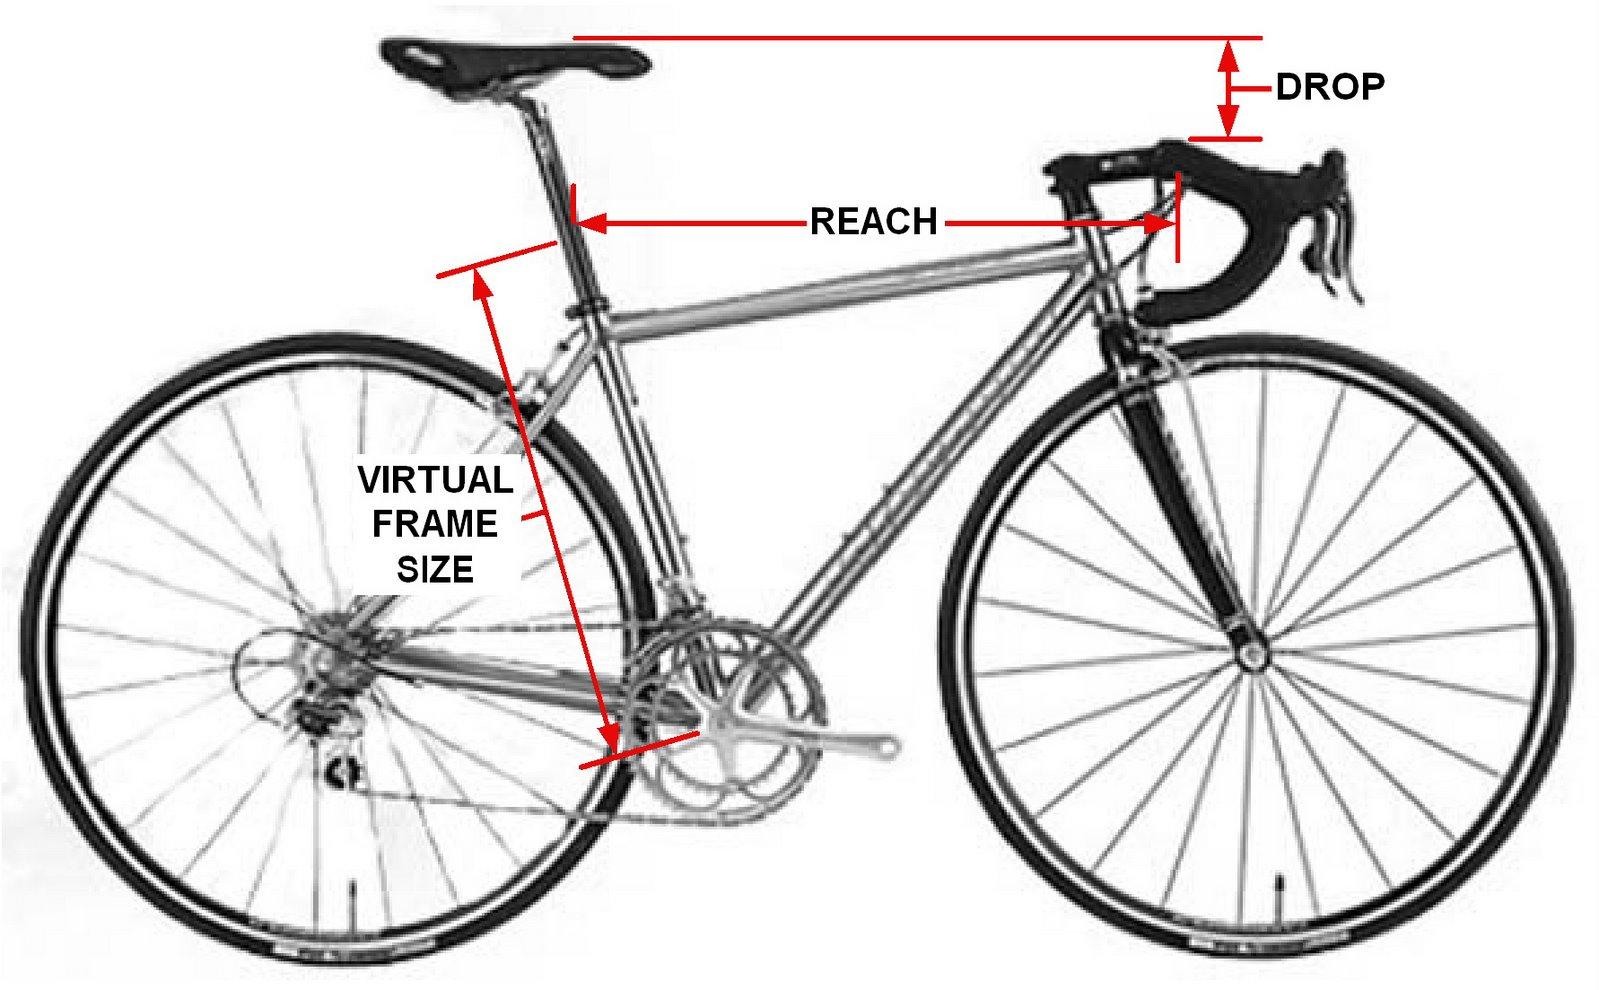 how to change stem on road bike